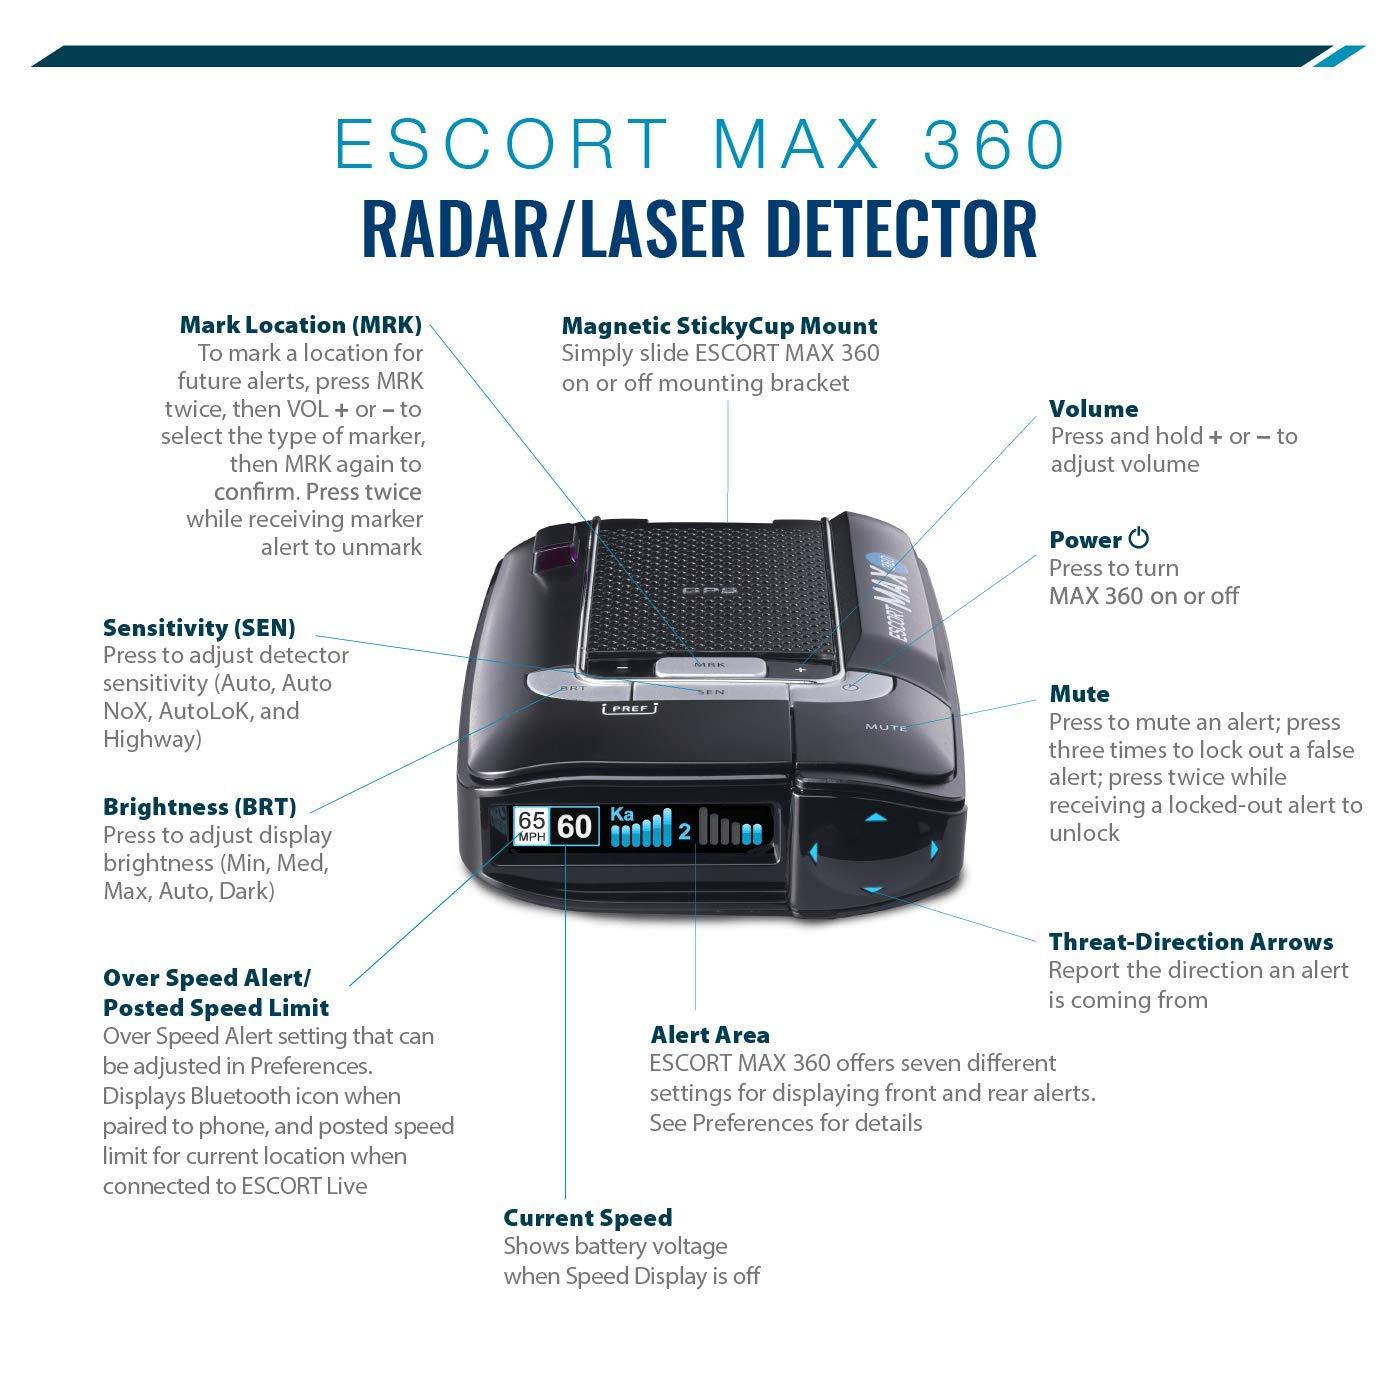 ESCORT MAX360 - Laser Radar Detector, GPS for Fewer False Alerts, Lightning  Fast Response, Directional Alerts, Dual Antenna Front and Rear, Bluetooth,